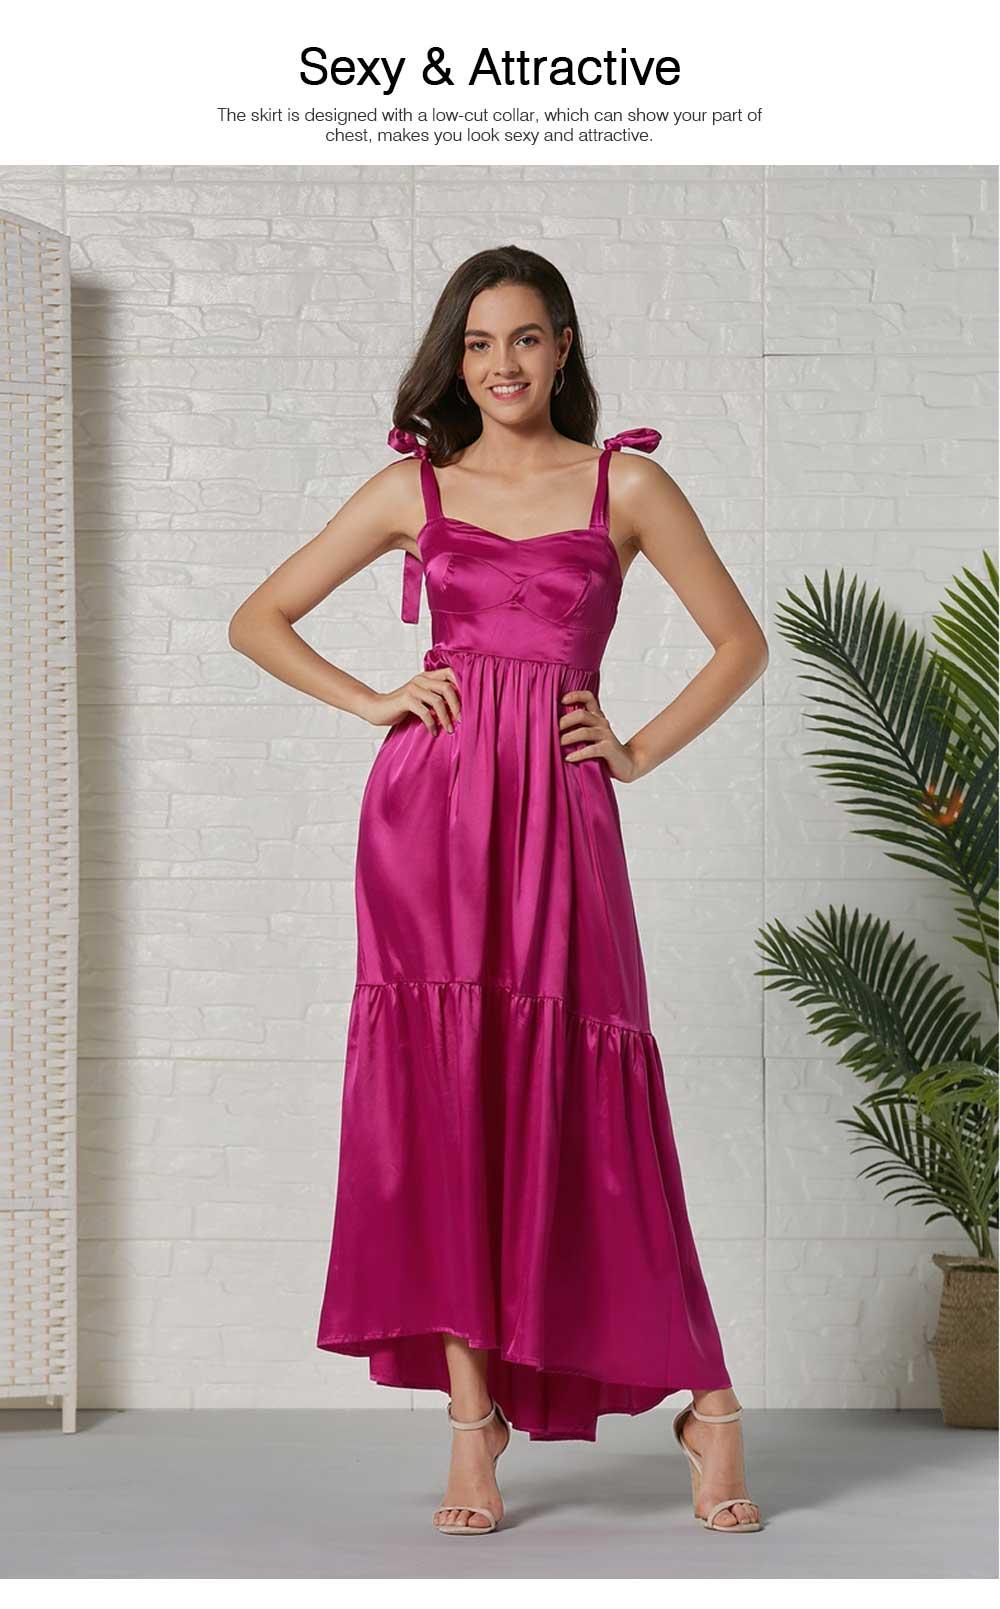 Lady Bohemian Dress Satin Flapper Hem Petticoat Binding Non-sleeve Long Purple Skirt Spring Summer for Women 2